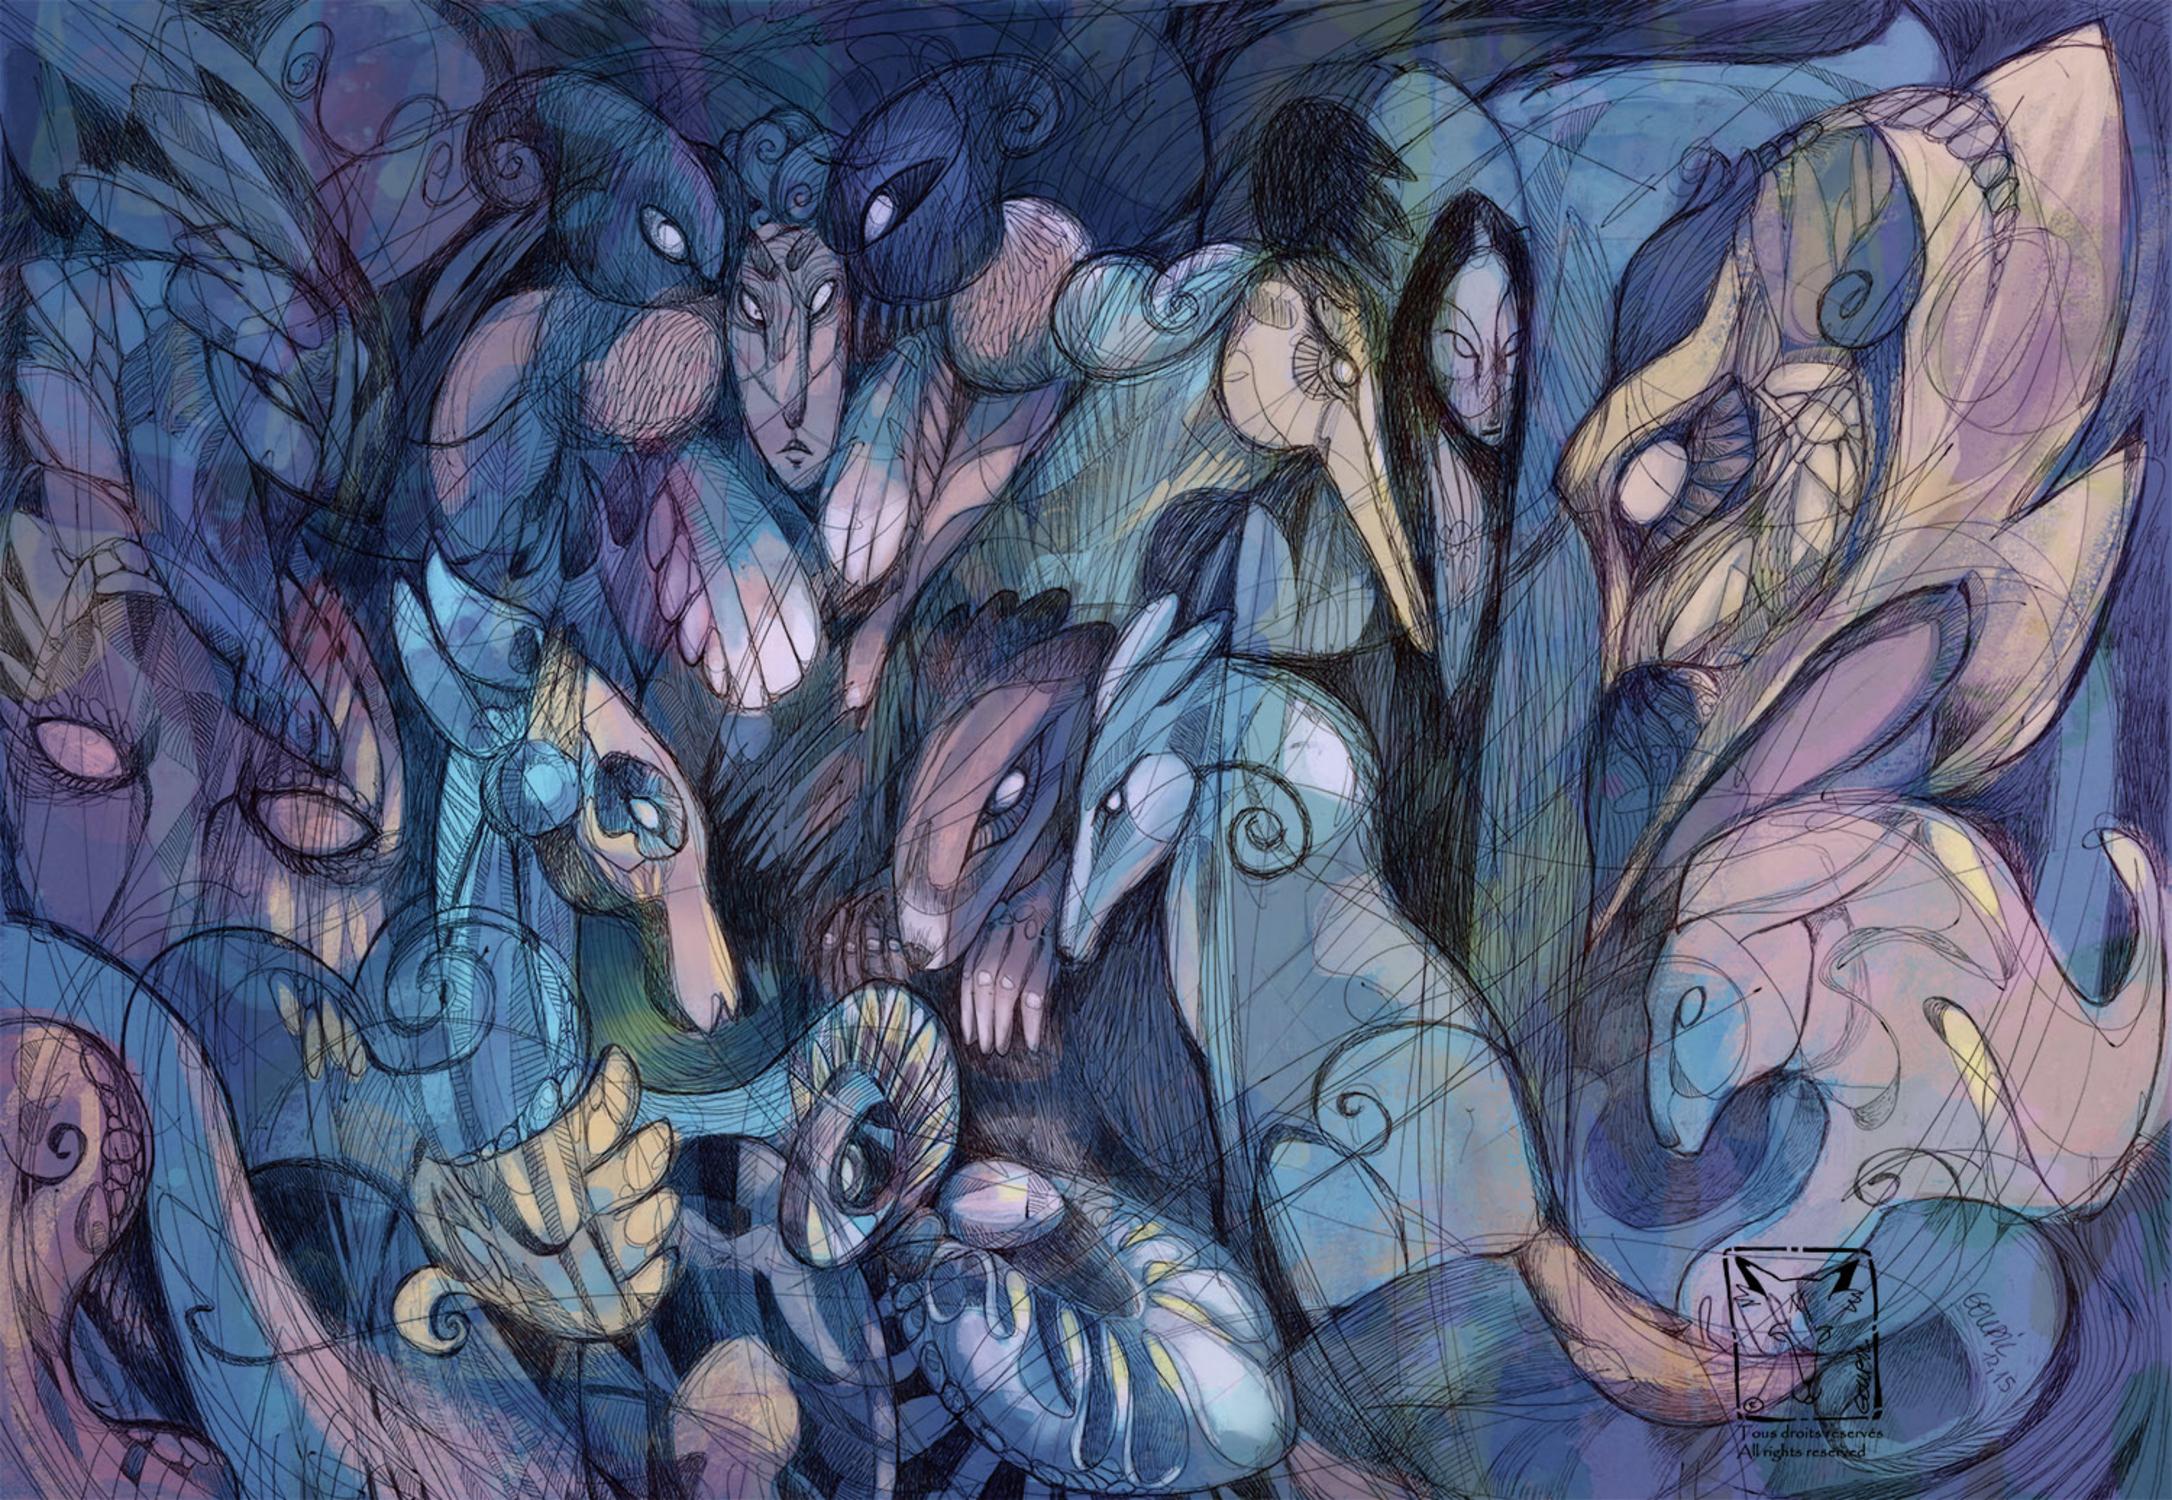 A Gathering of Beasts Artwork by Sunila Sen Gupta